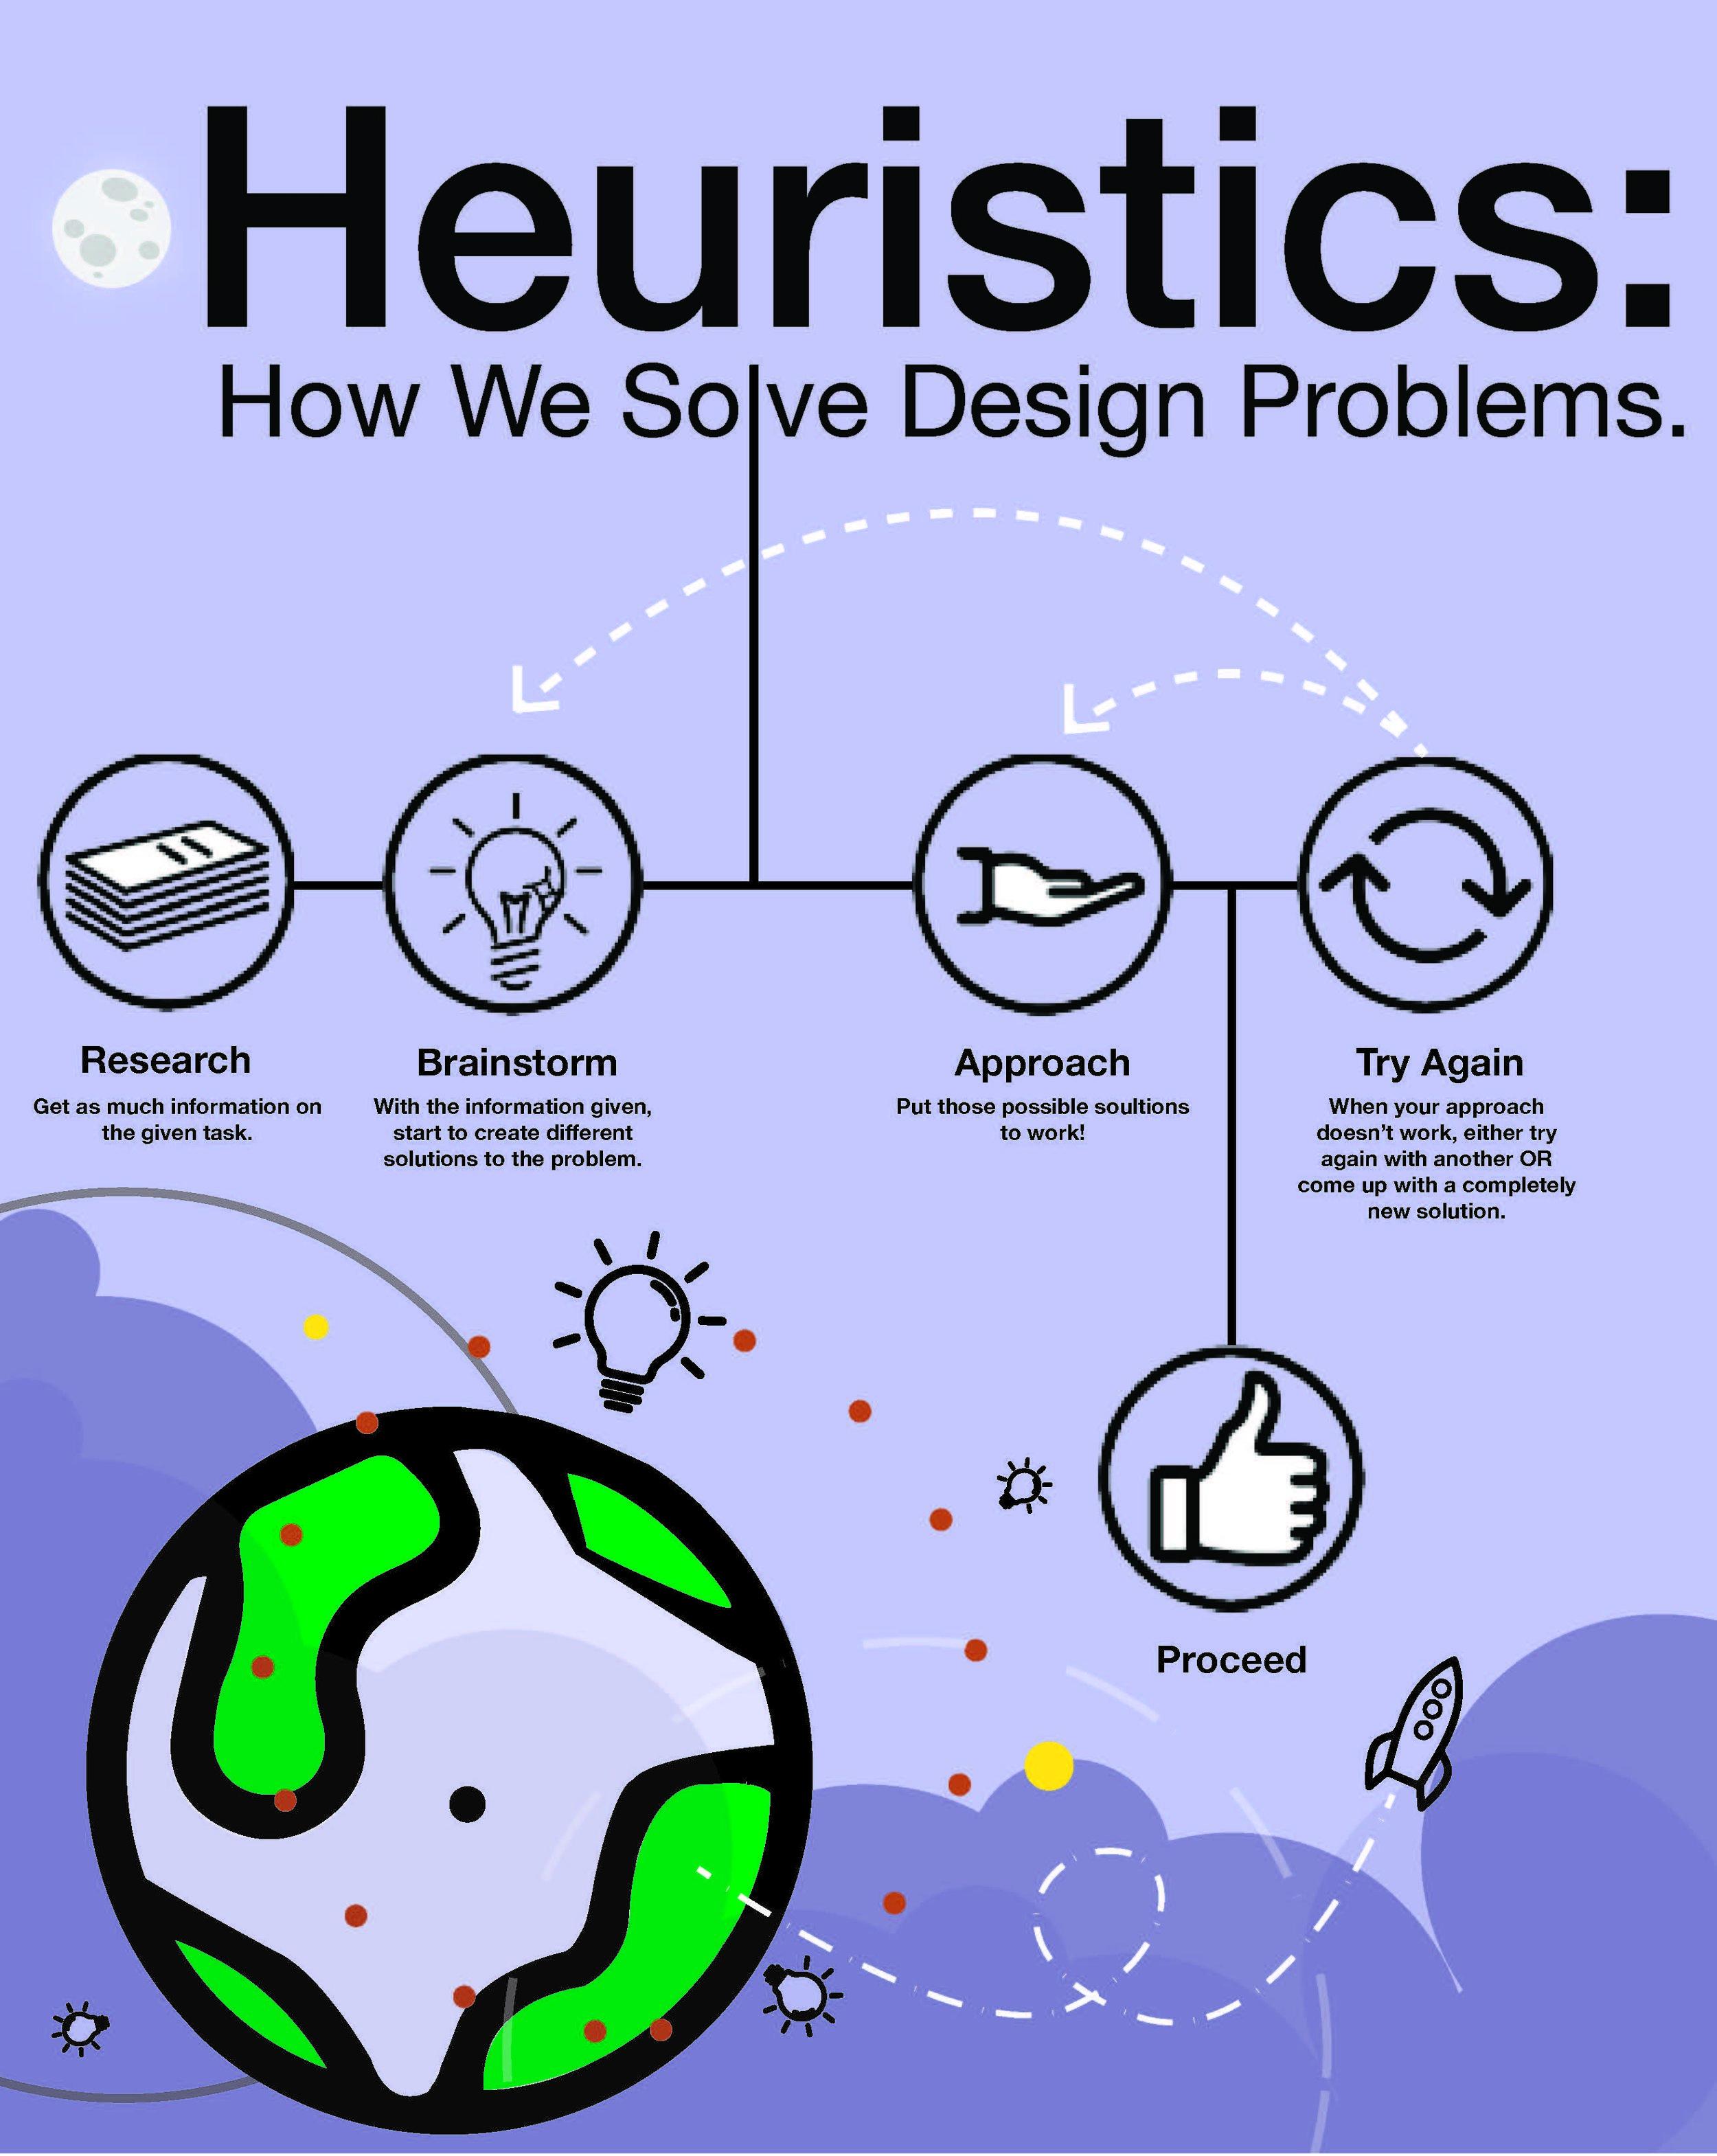 heurisitics.jpg